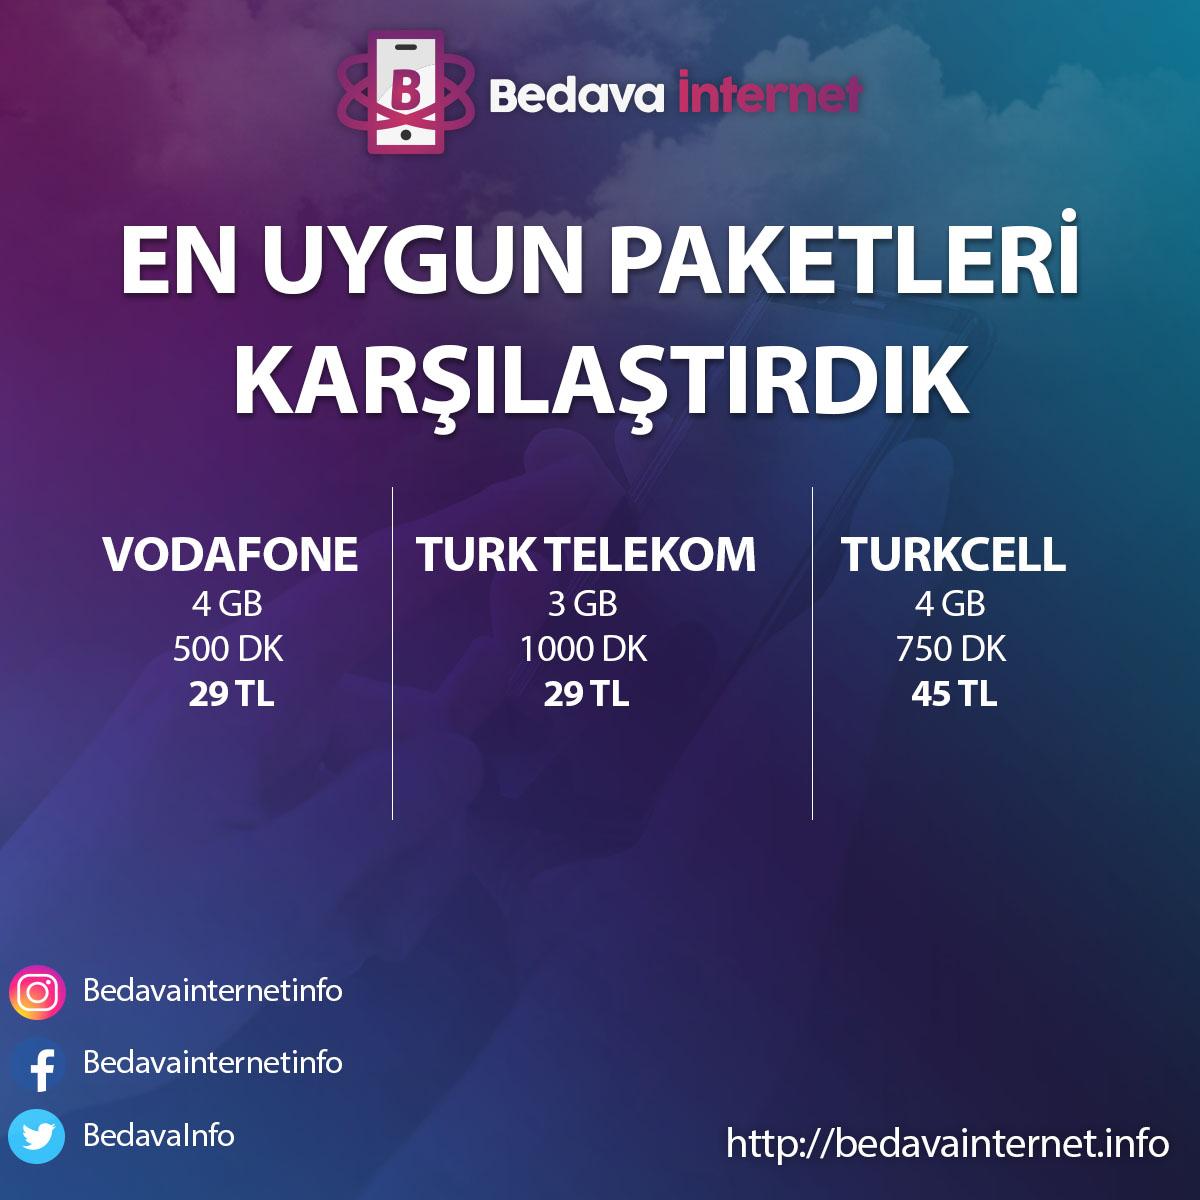 En Ucuz Paket - Vodafone, Turkcell ve Turk Telekom Karşılaştırma